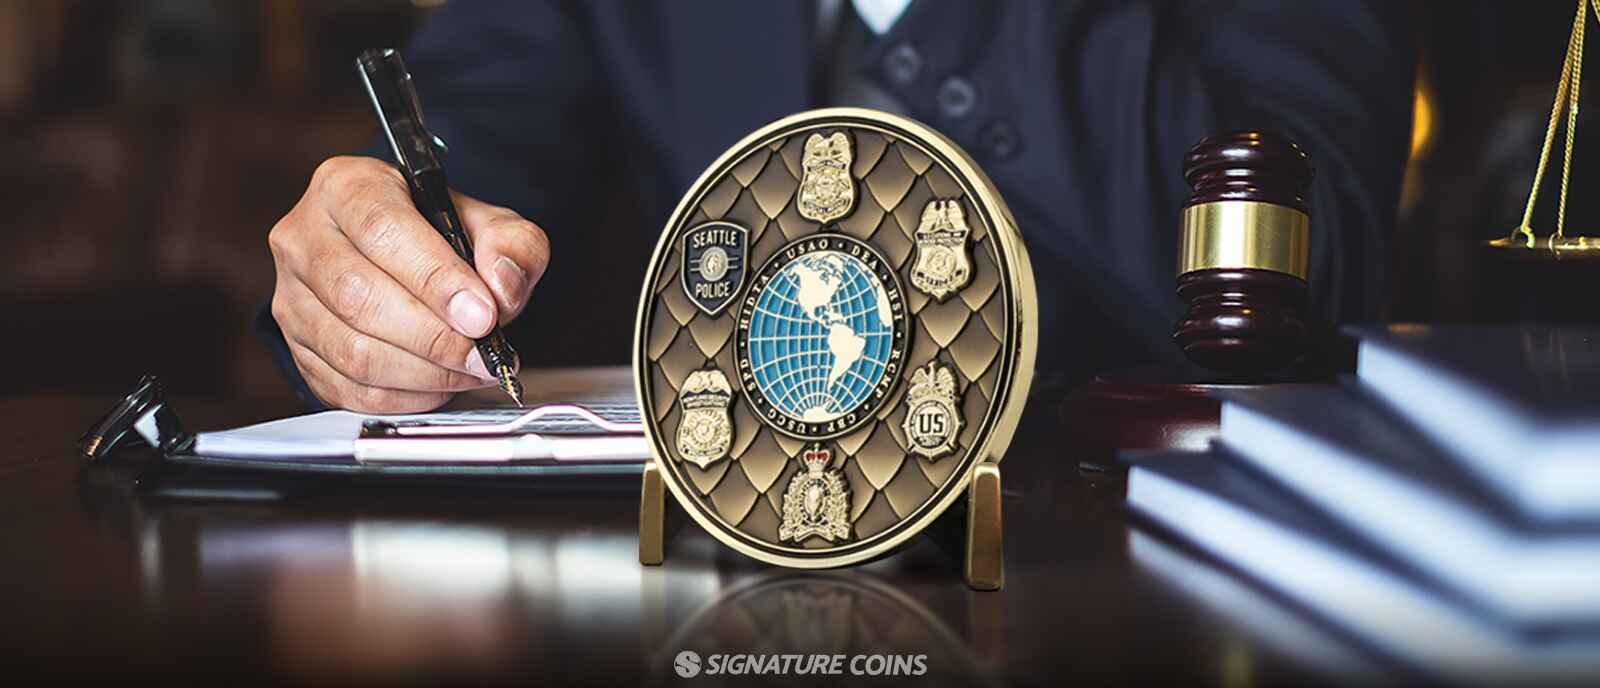 law-enforcement-challege coin1